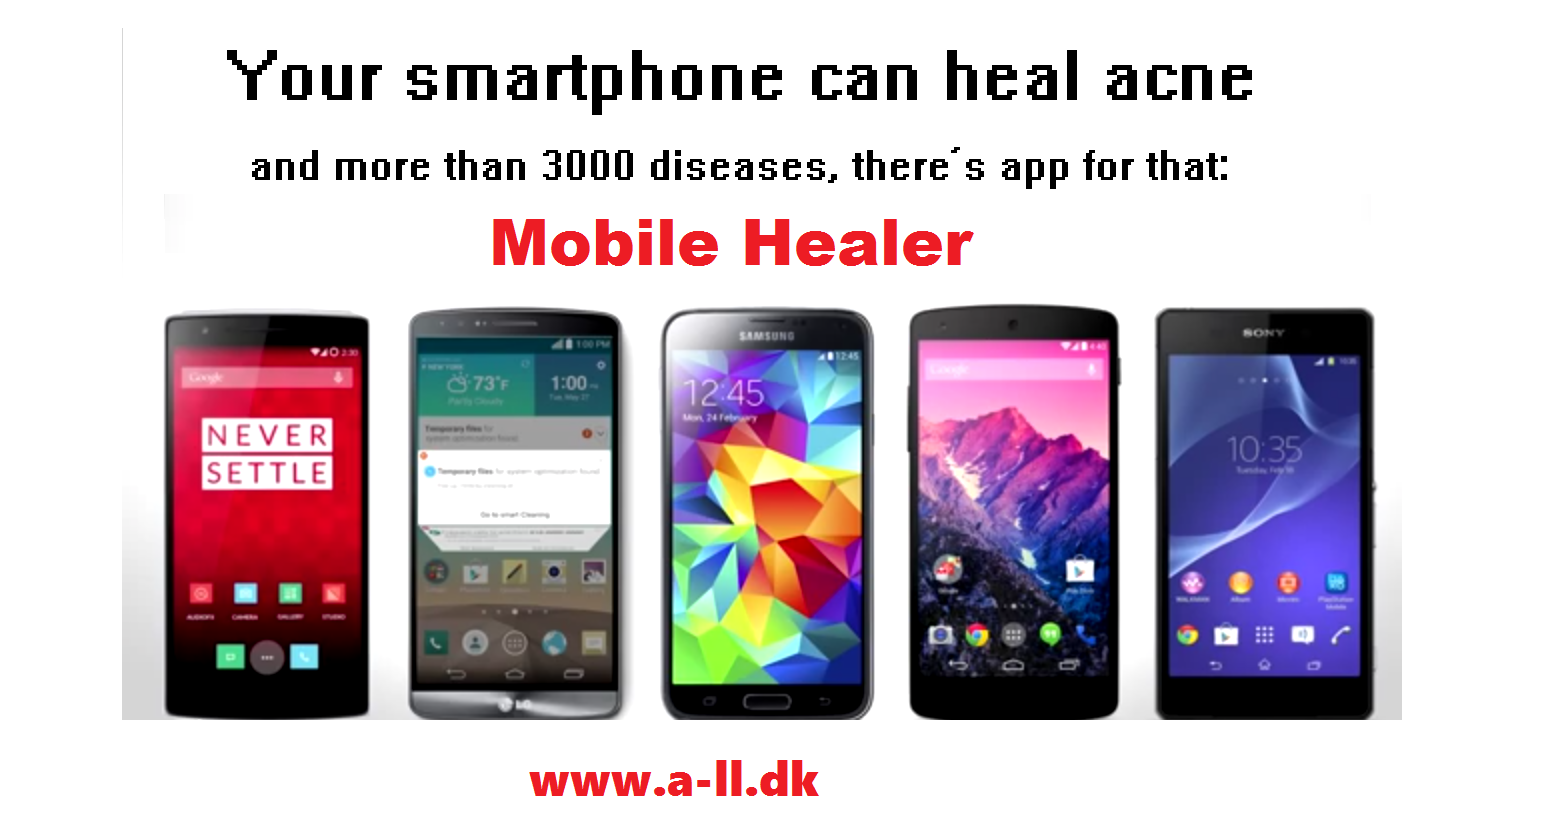 http://a-ll.dk/mobile_Healer.htm